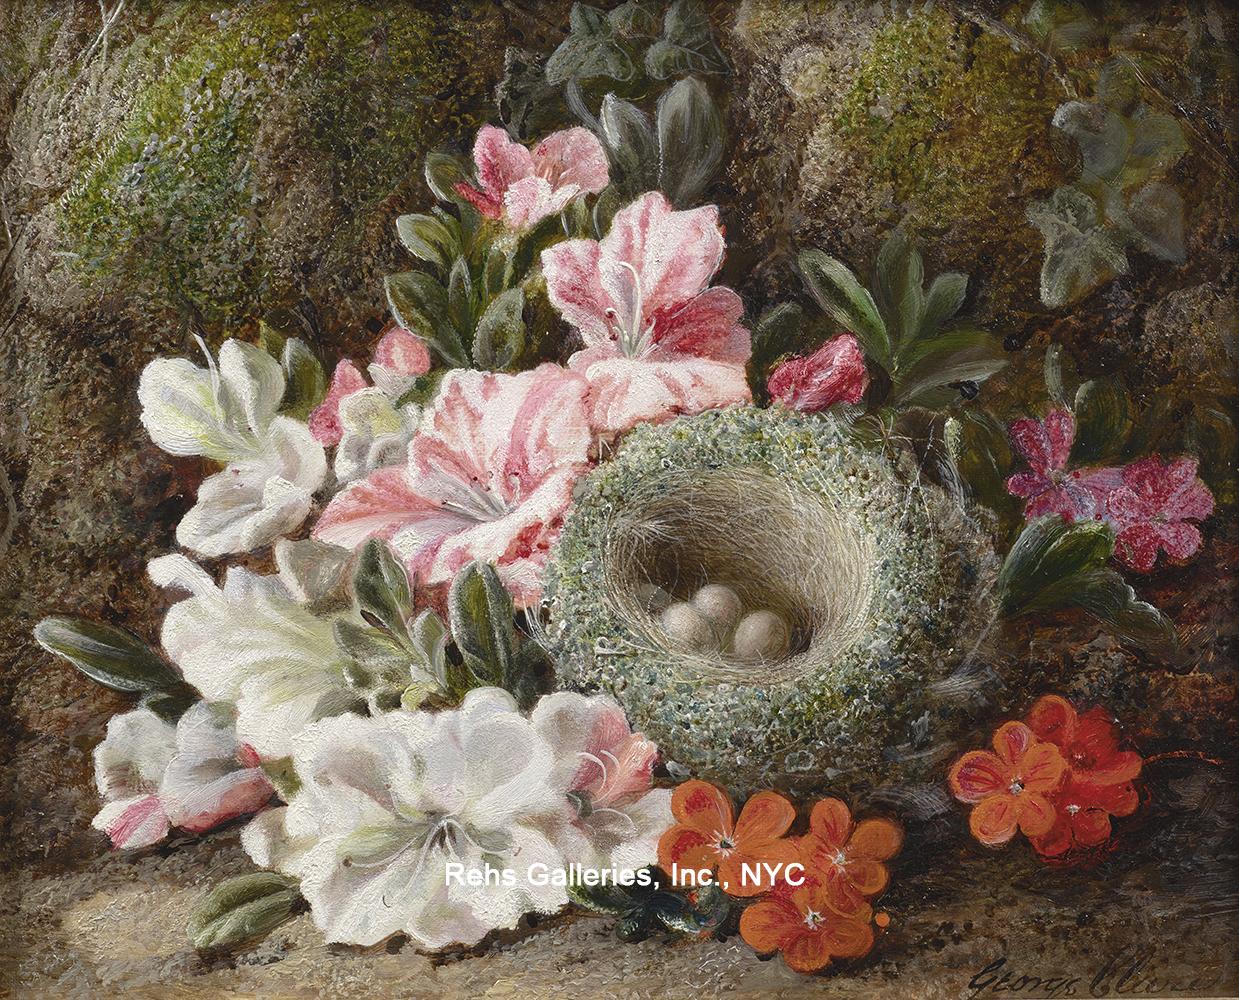 george_clare_e1381_still_life_of_flowers_and_birds_nest_wm.jpg